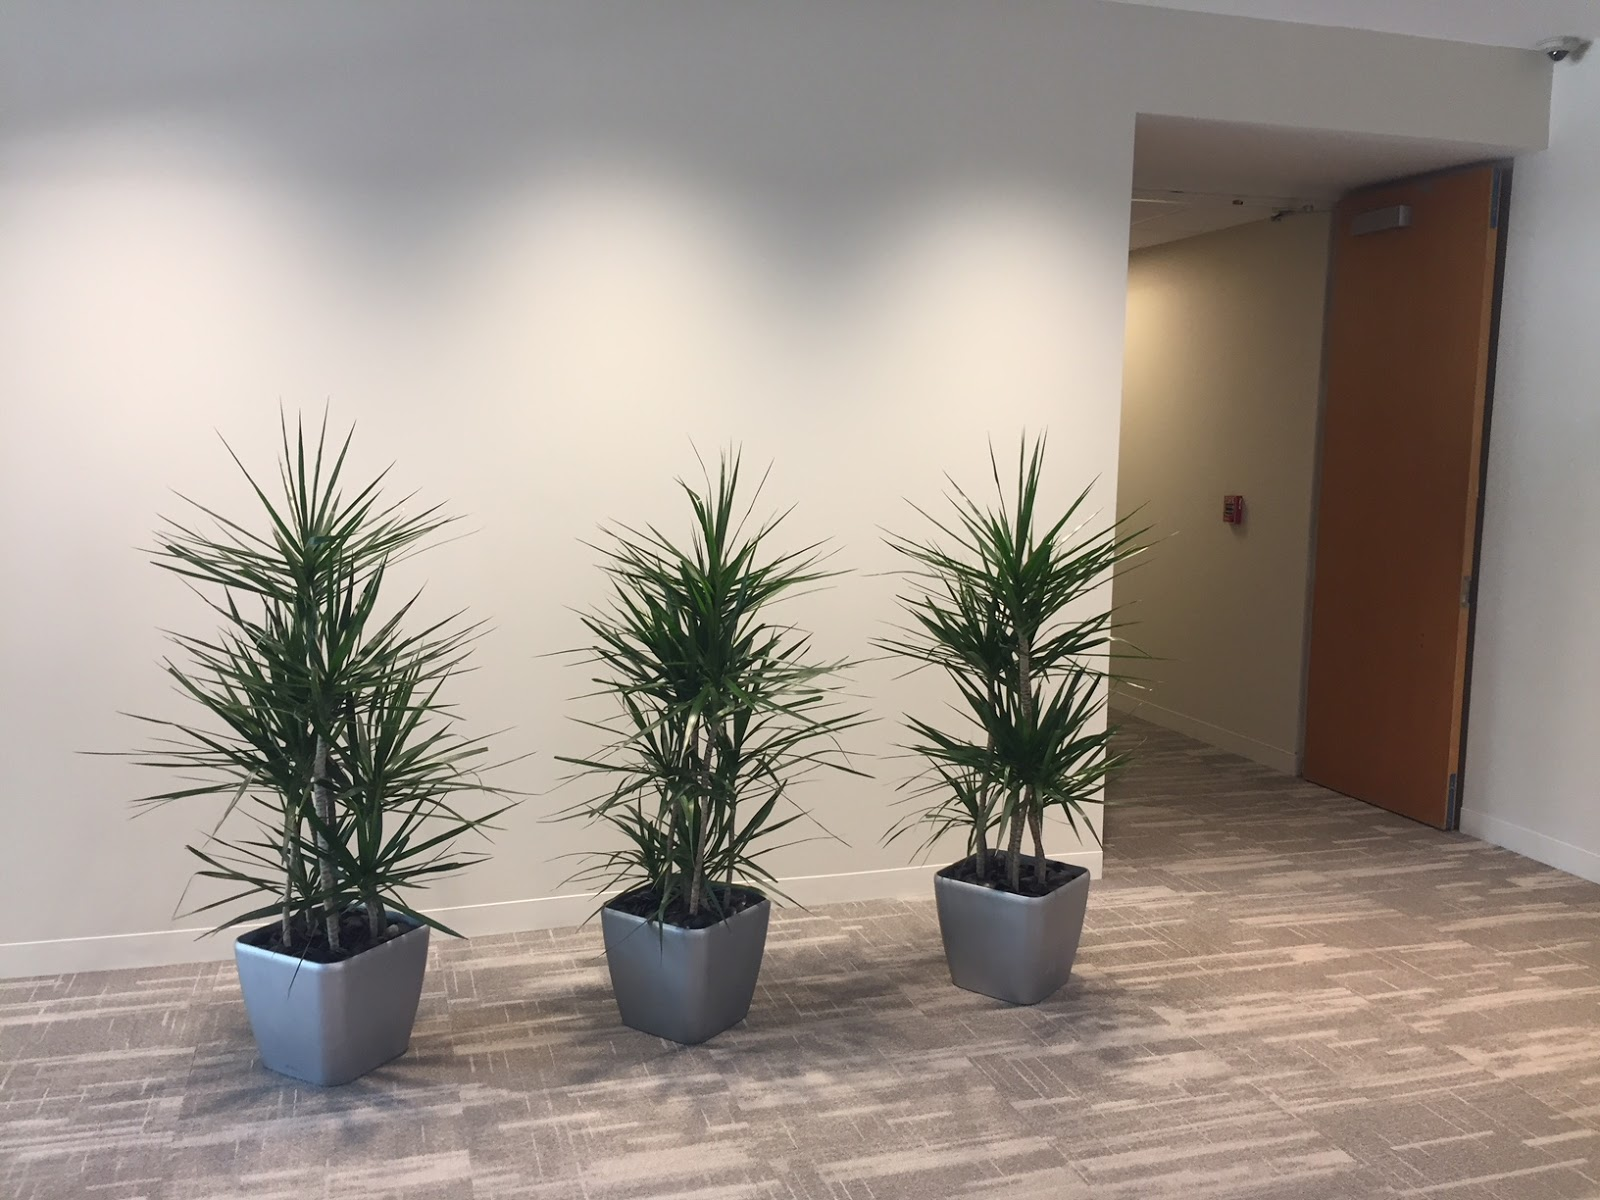 Interior Office Plants With Lexington Ma Lobby Interior Office Plants Design By Plantscape Designs Inc Pdi Blog